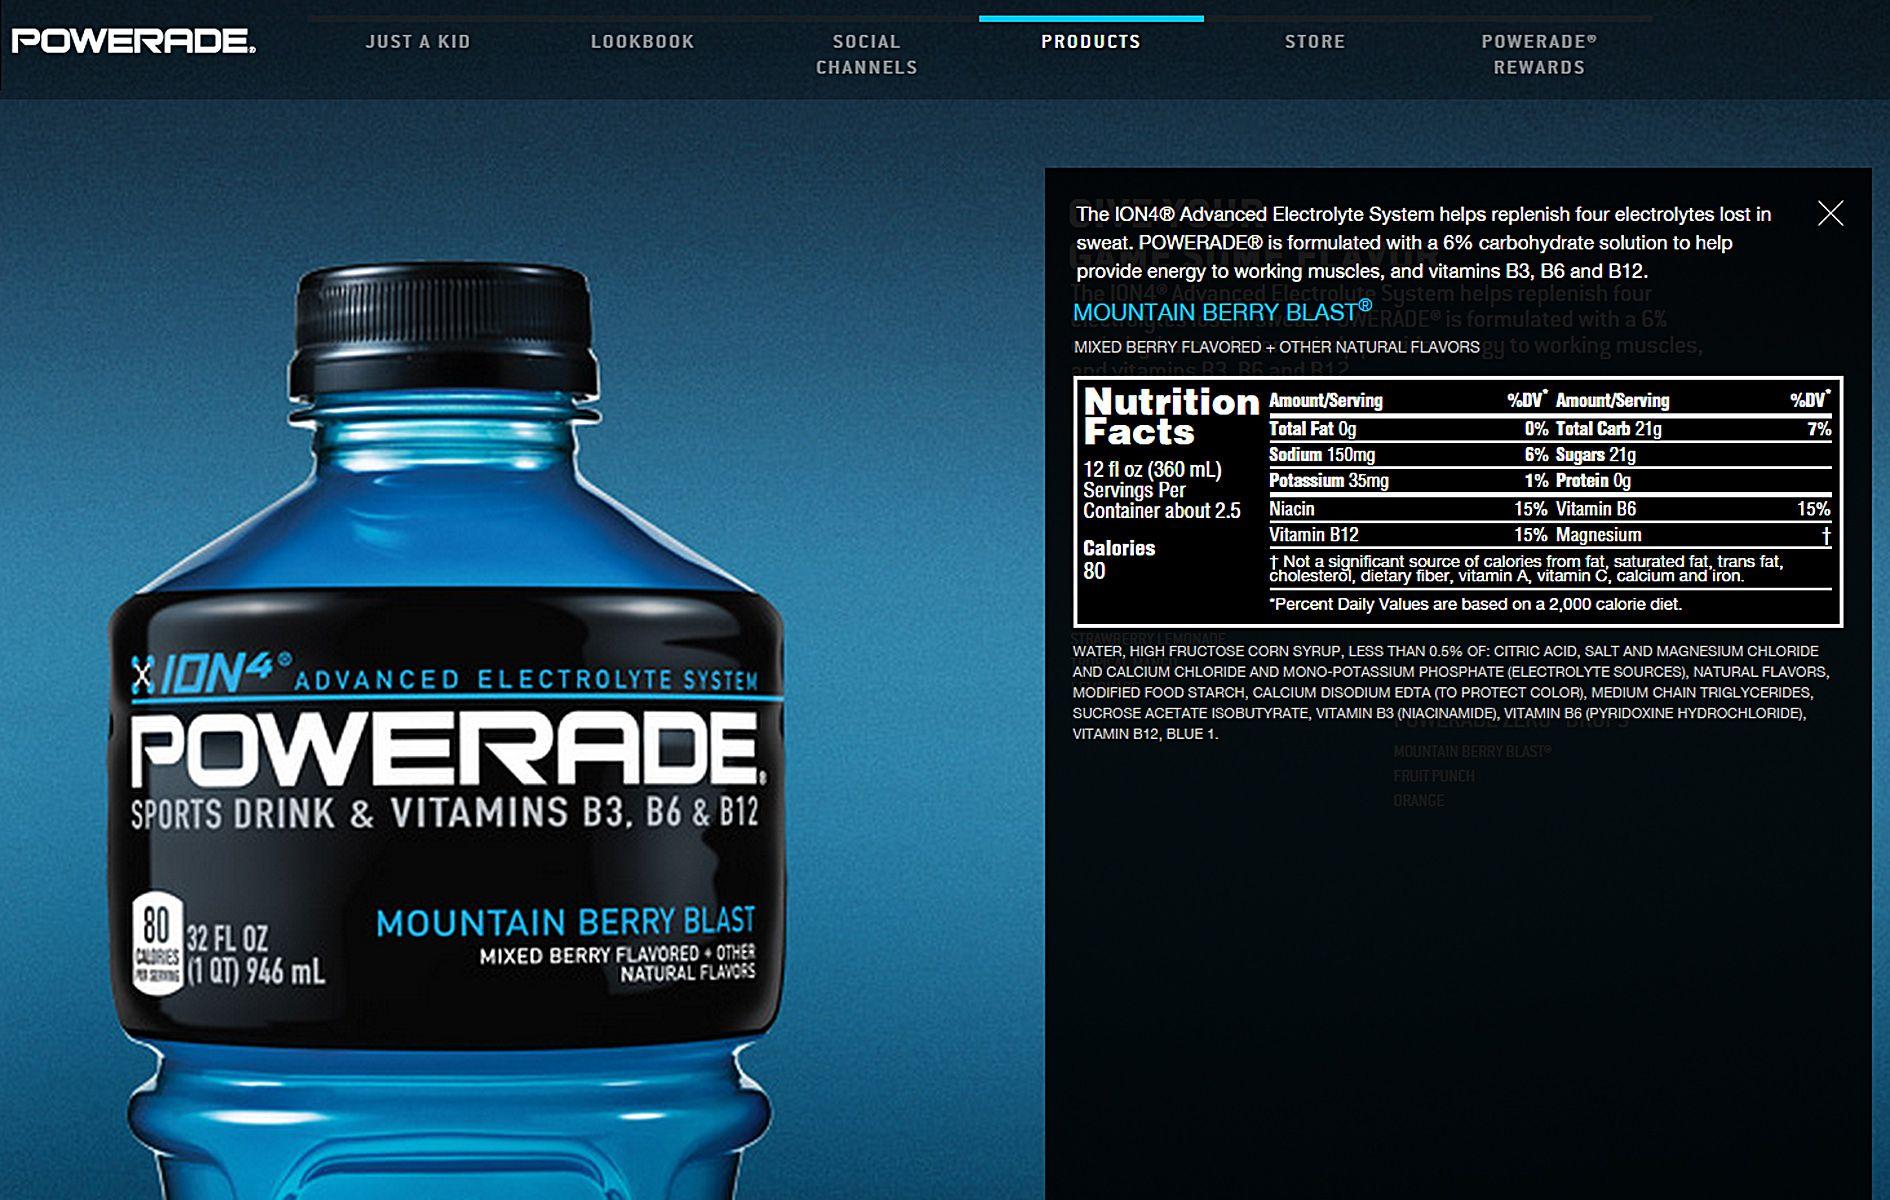 powerade website google search bottle label template. Black Bedroom Furniture Sets. Home Design Ideas